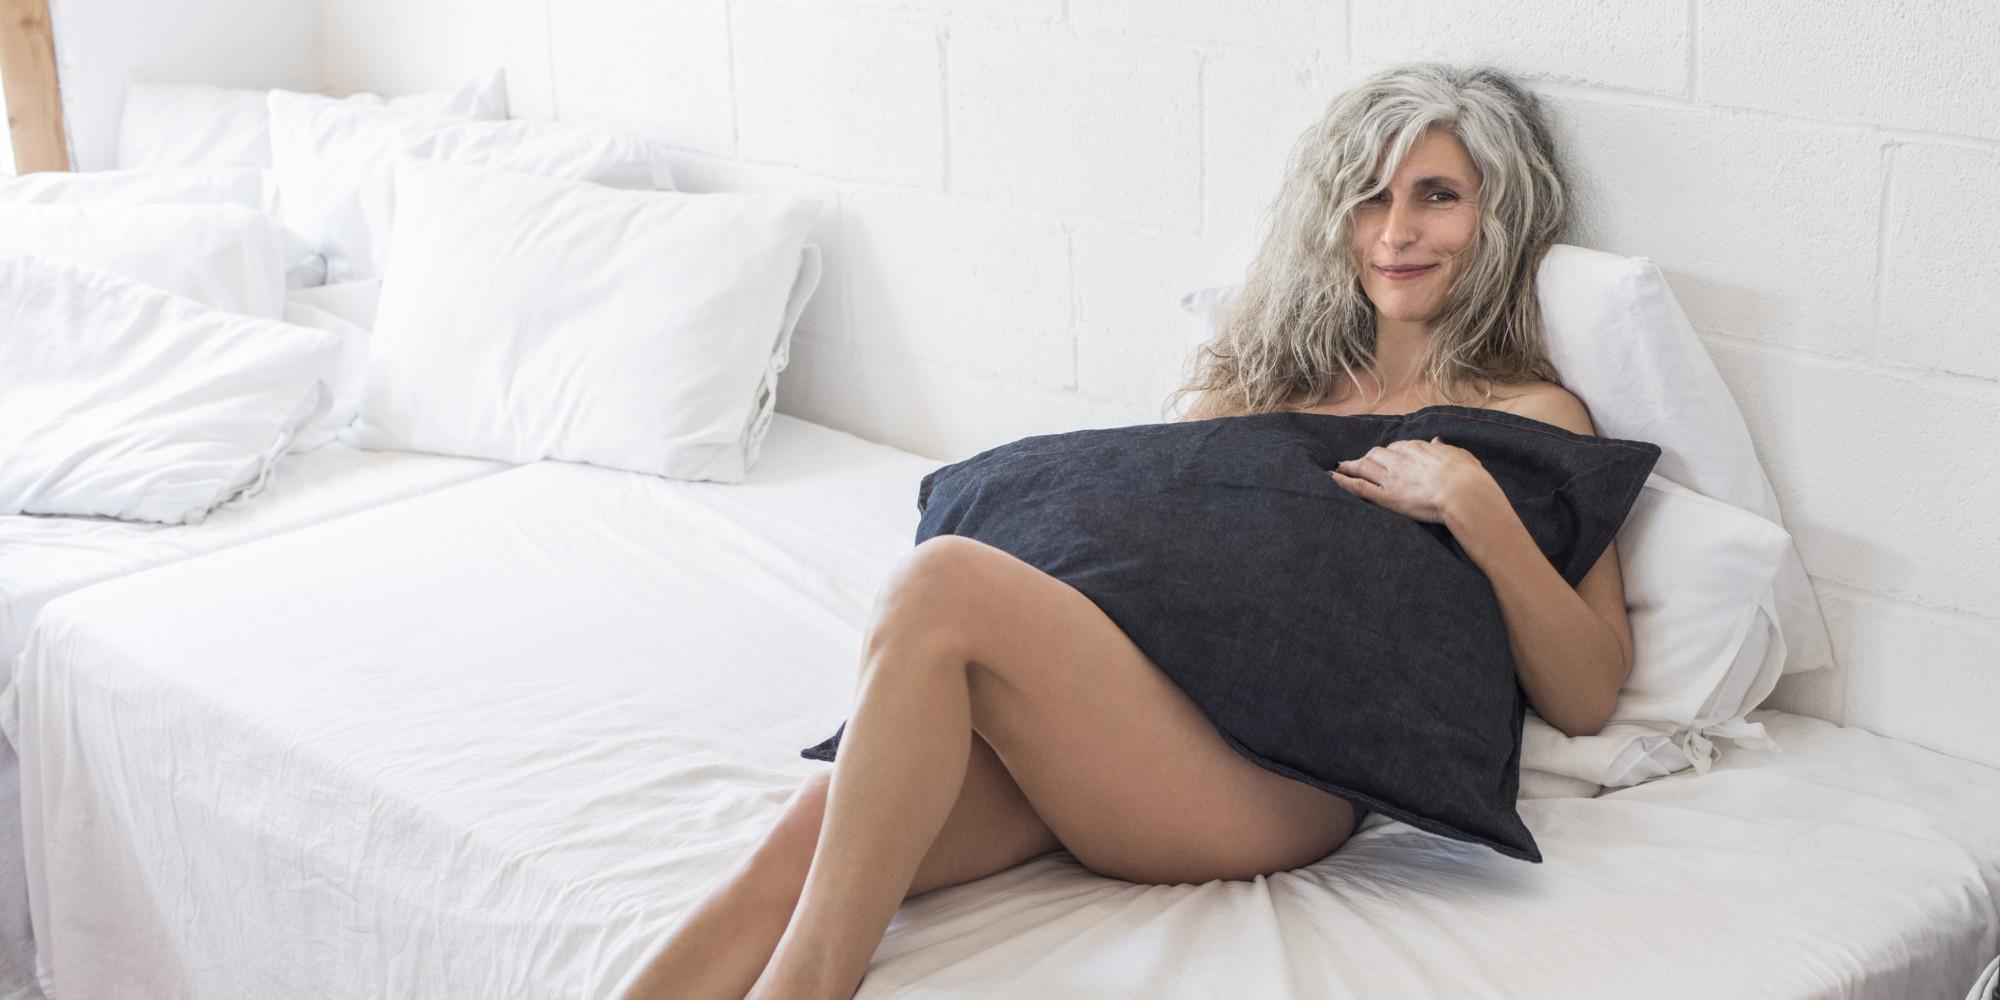 Sex For Woman 65 To 70 Single Looking Massazhnyy